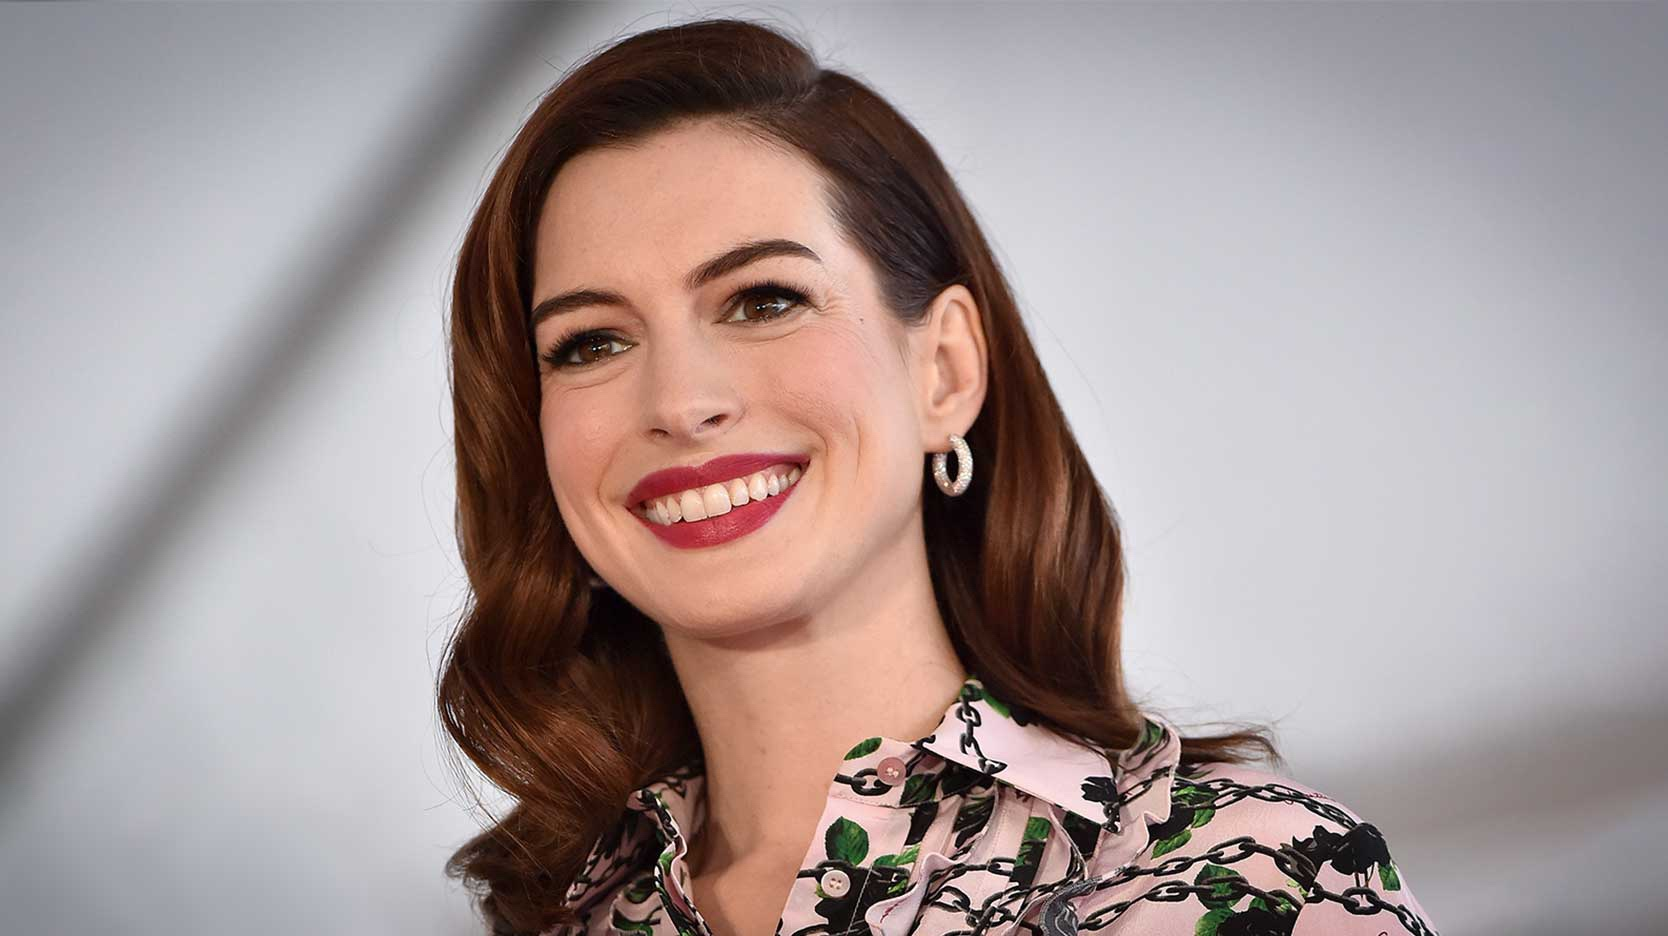 Anne Hathaway scrabble player